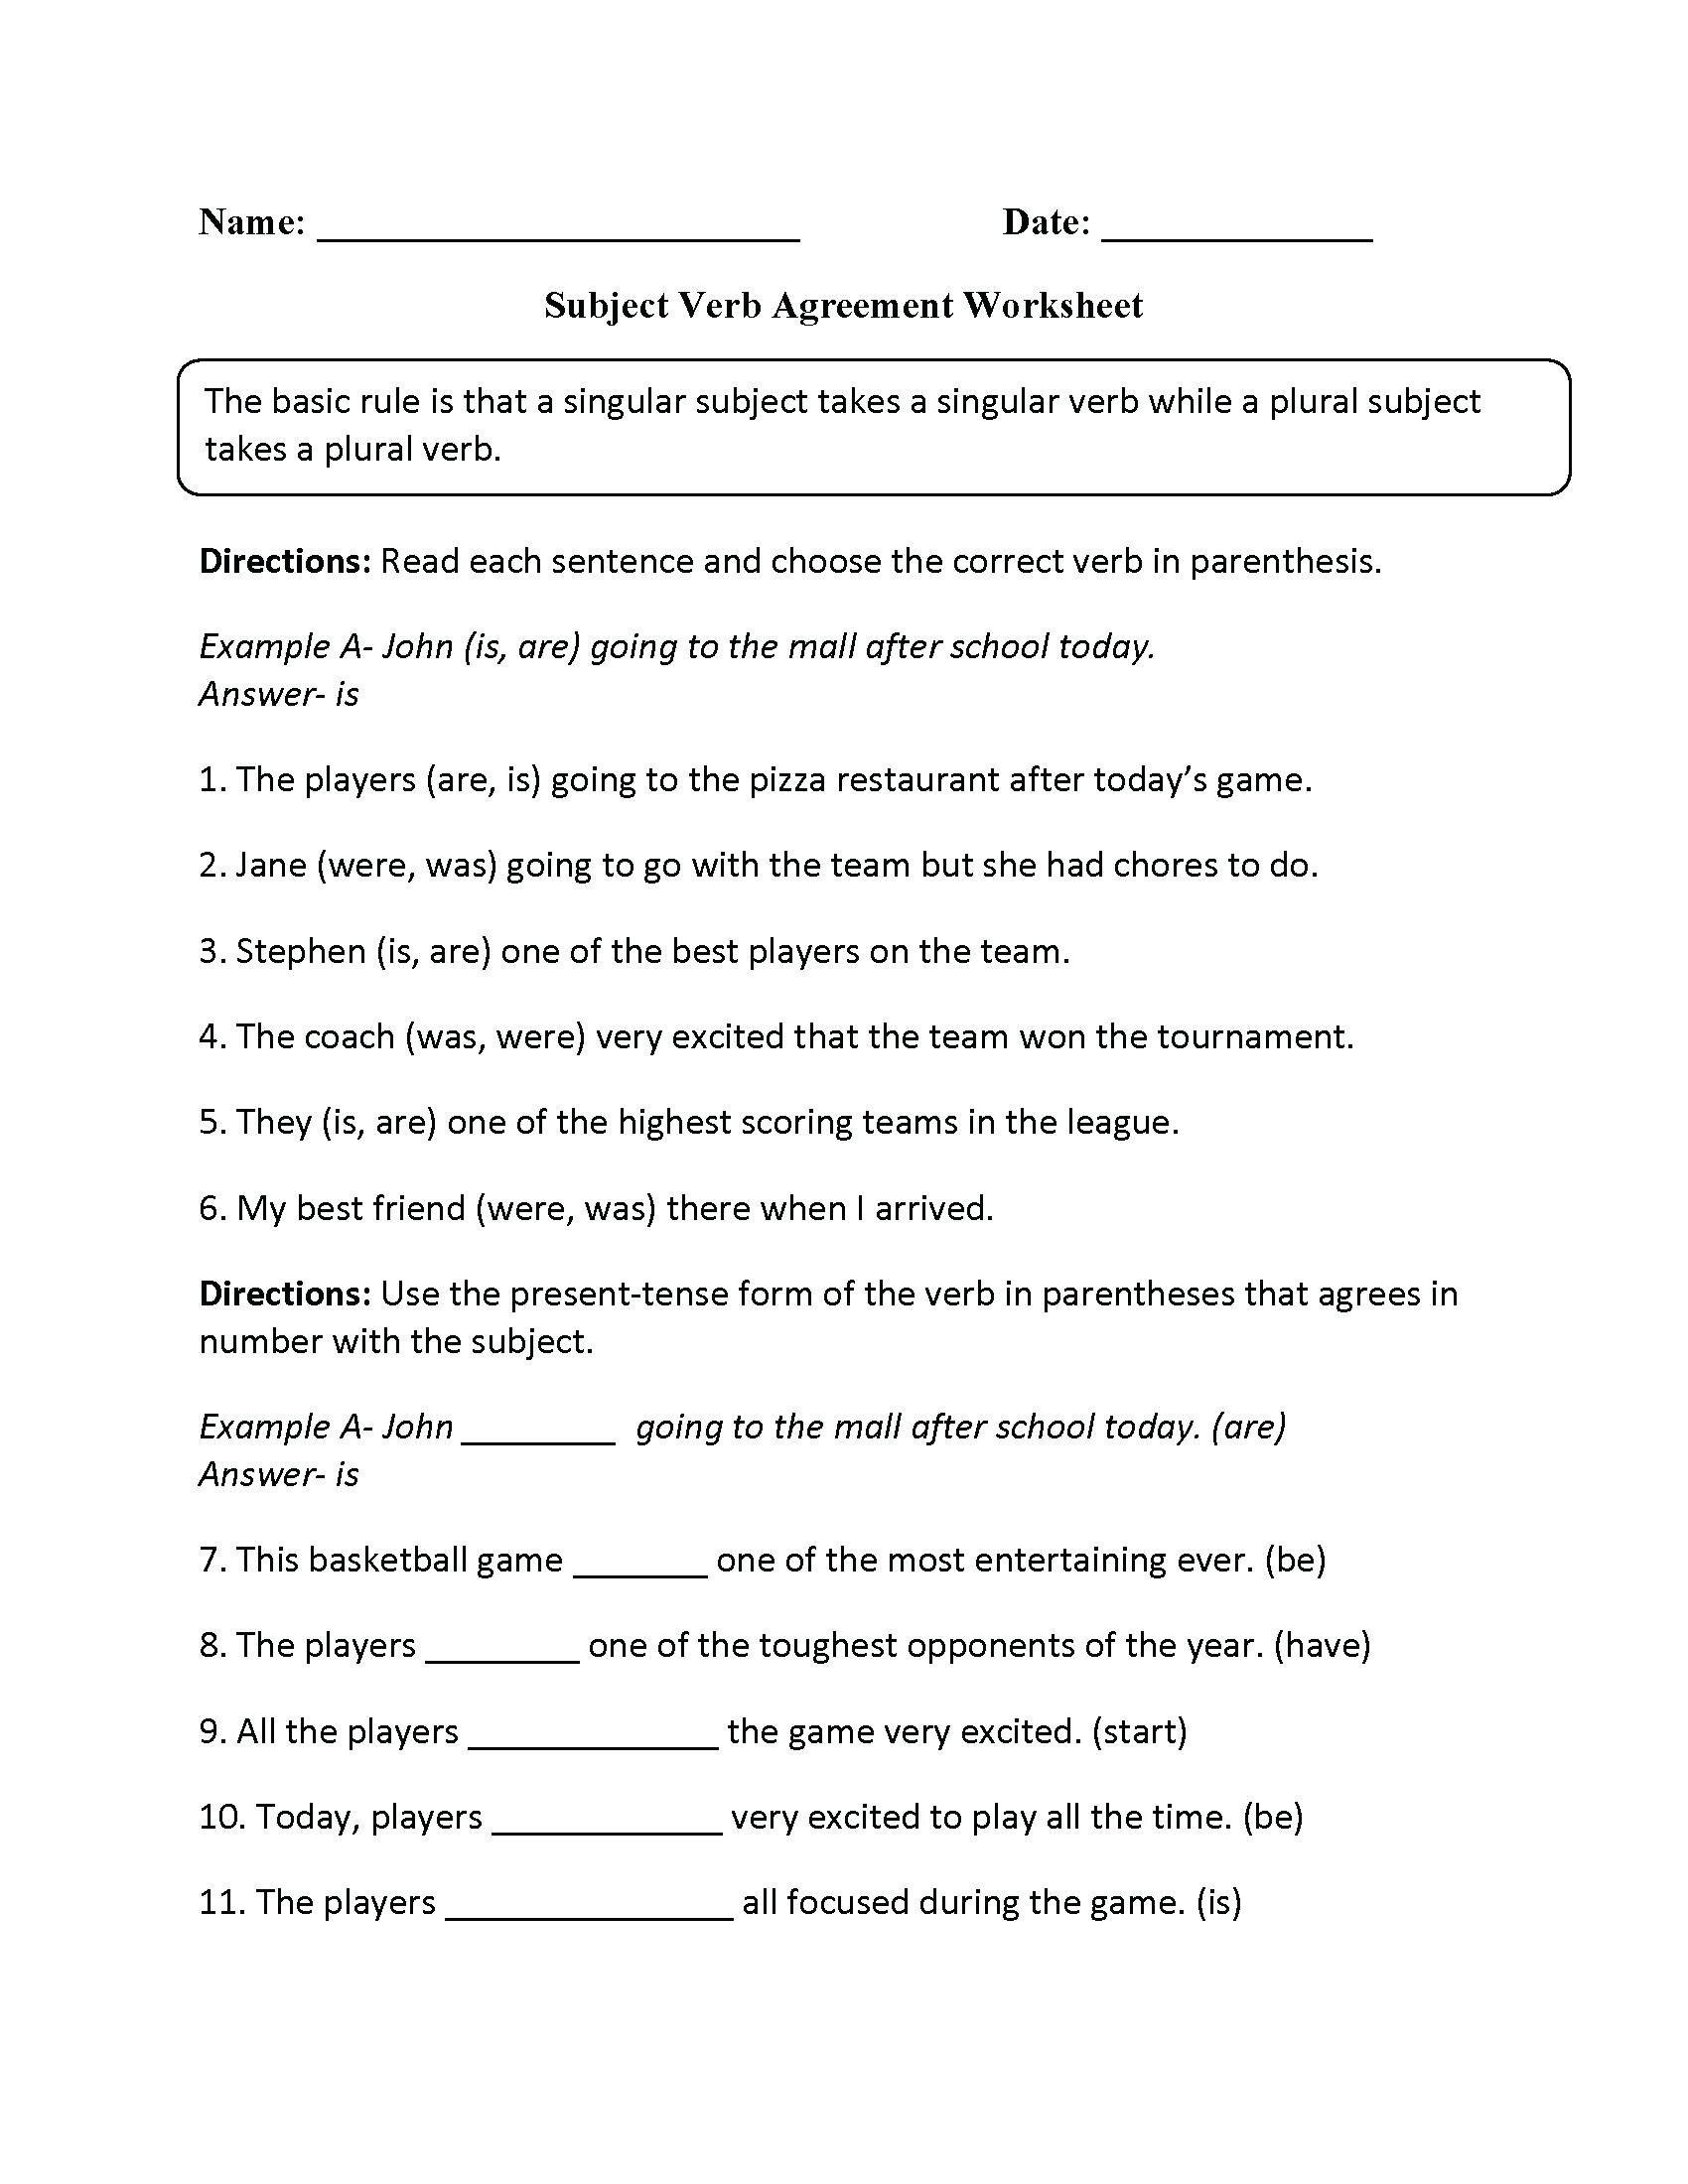 Grammar Worksheet 6th Grade Grammar Worksheets Free Grammar Worksheet Punctuation Worksheets